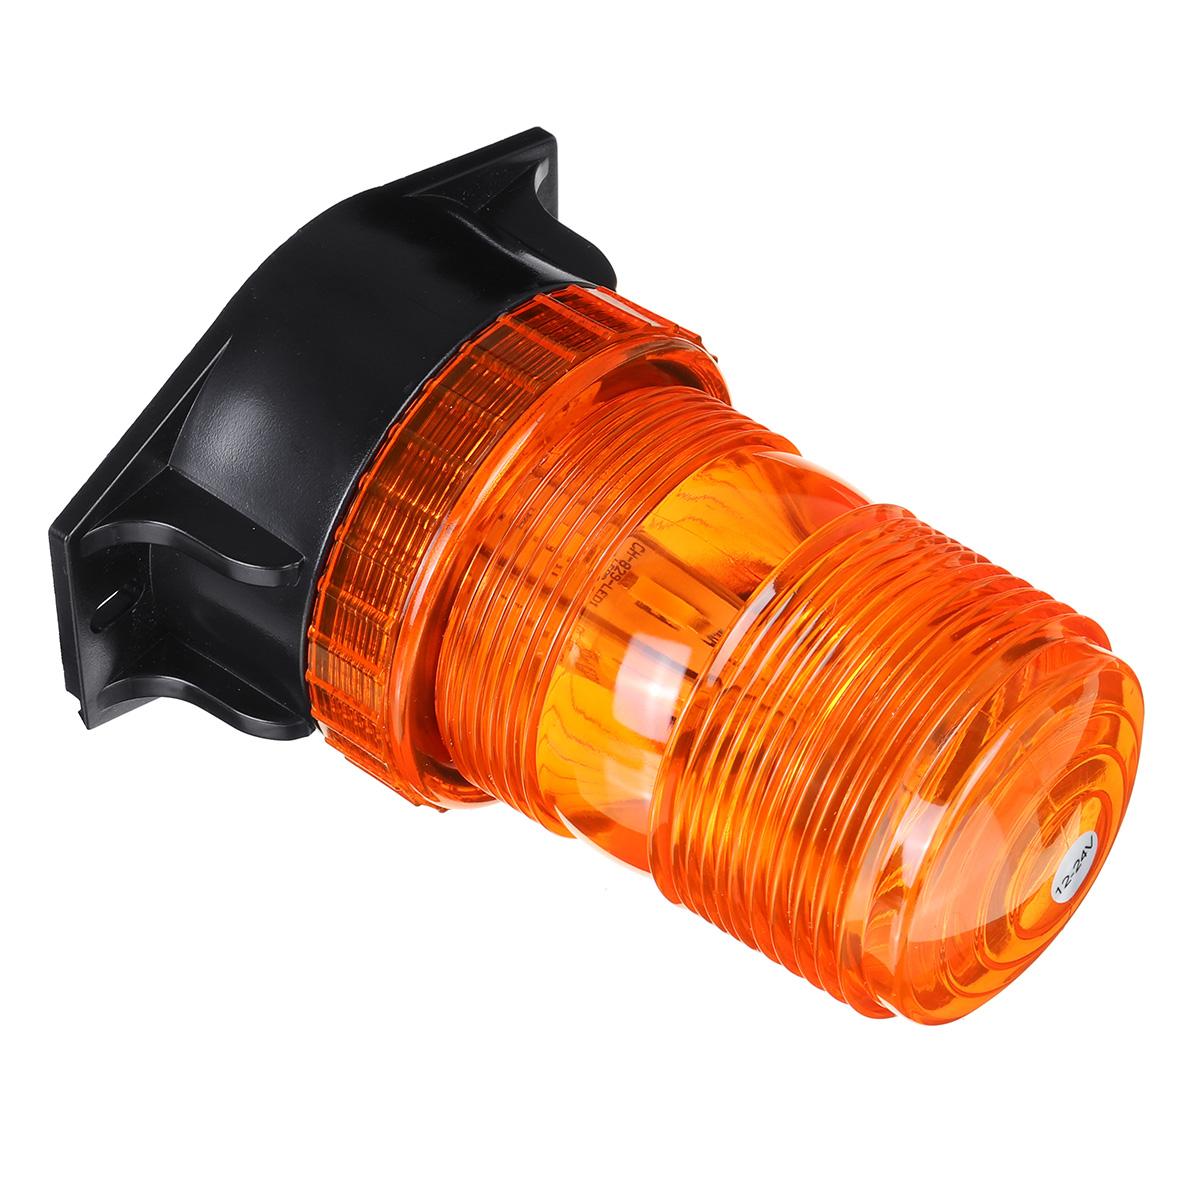 12V-24V 30 LED 5730 Rotating Flashing Amber Beacon Flexible Tractor Warning Light For ATV Boat Truck Agricultural Machiney Vehicle